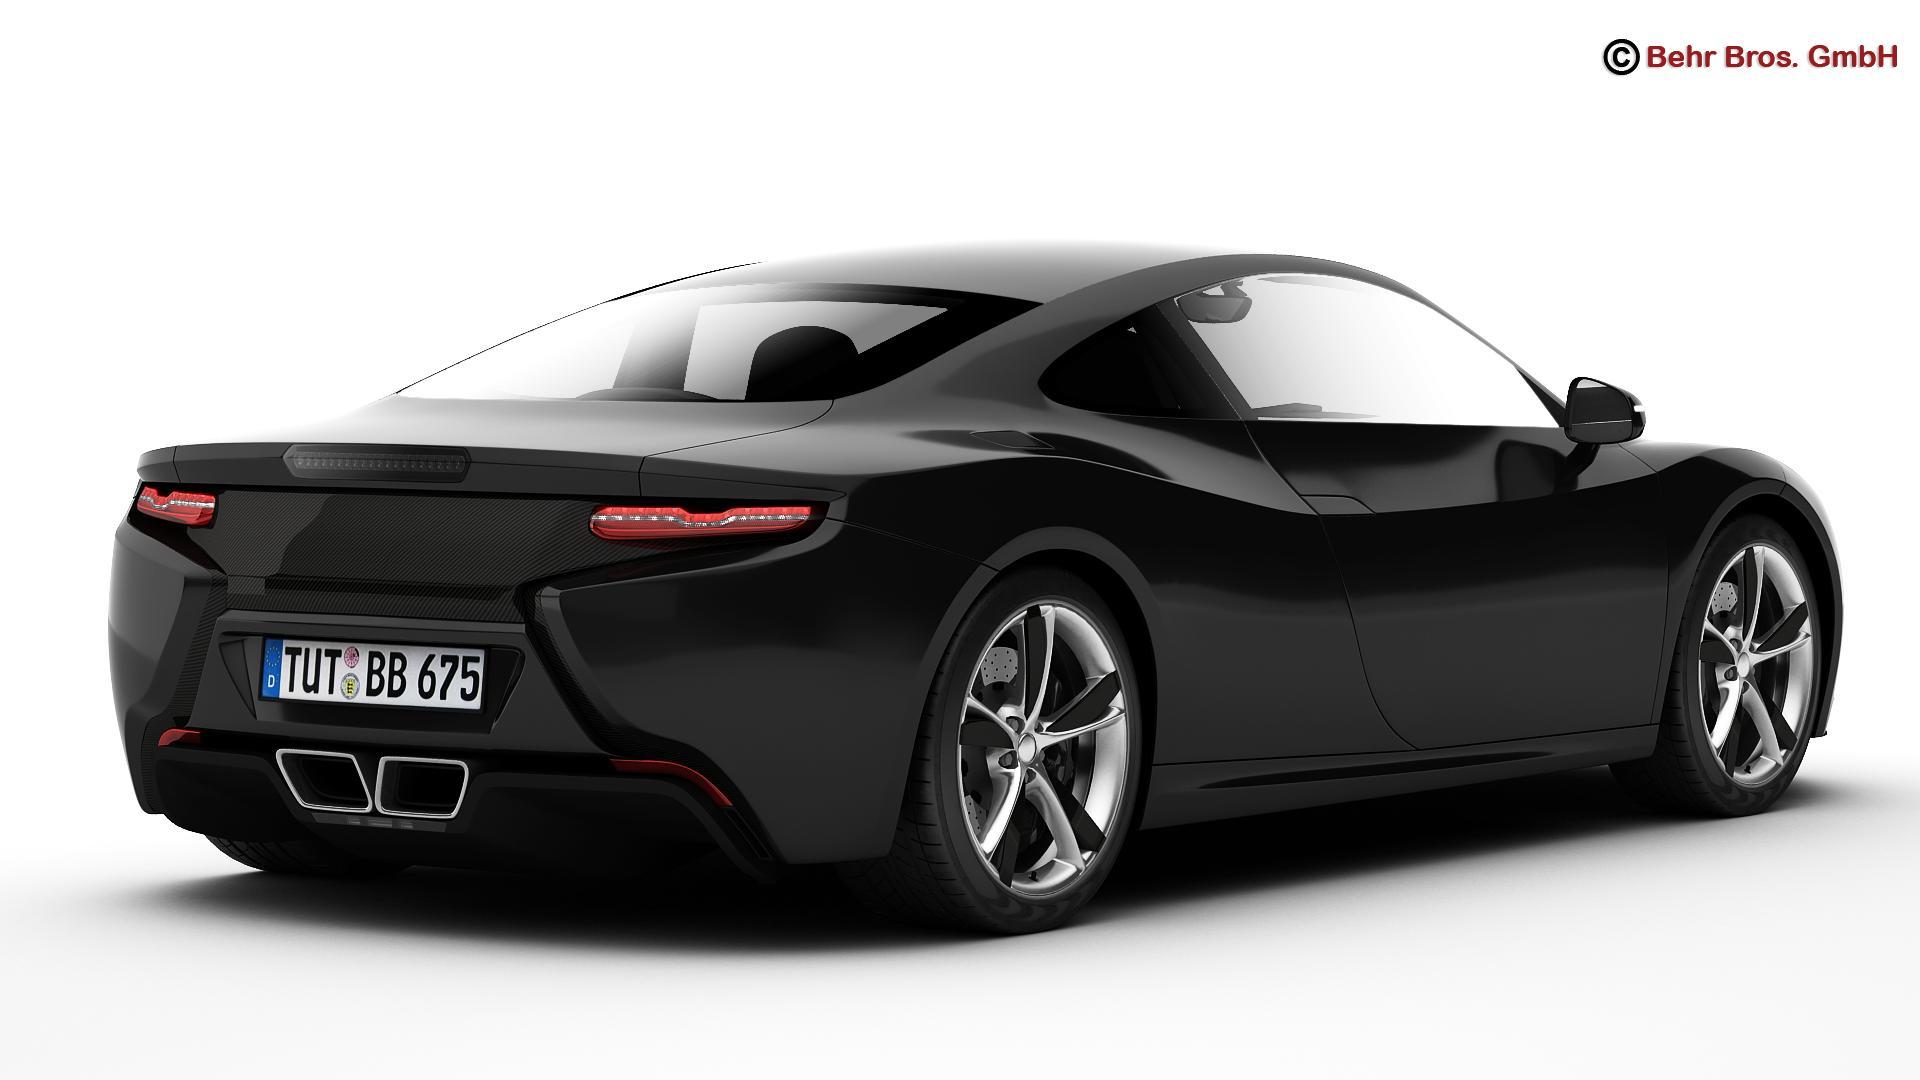 generic sports car 3d model 3ds max fbx c4d lwo ma mb obj 160522